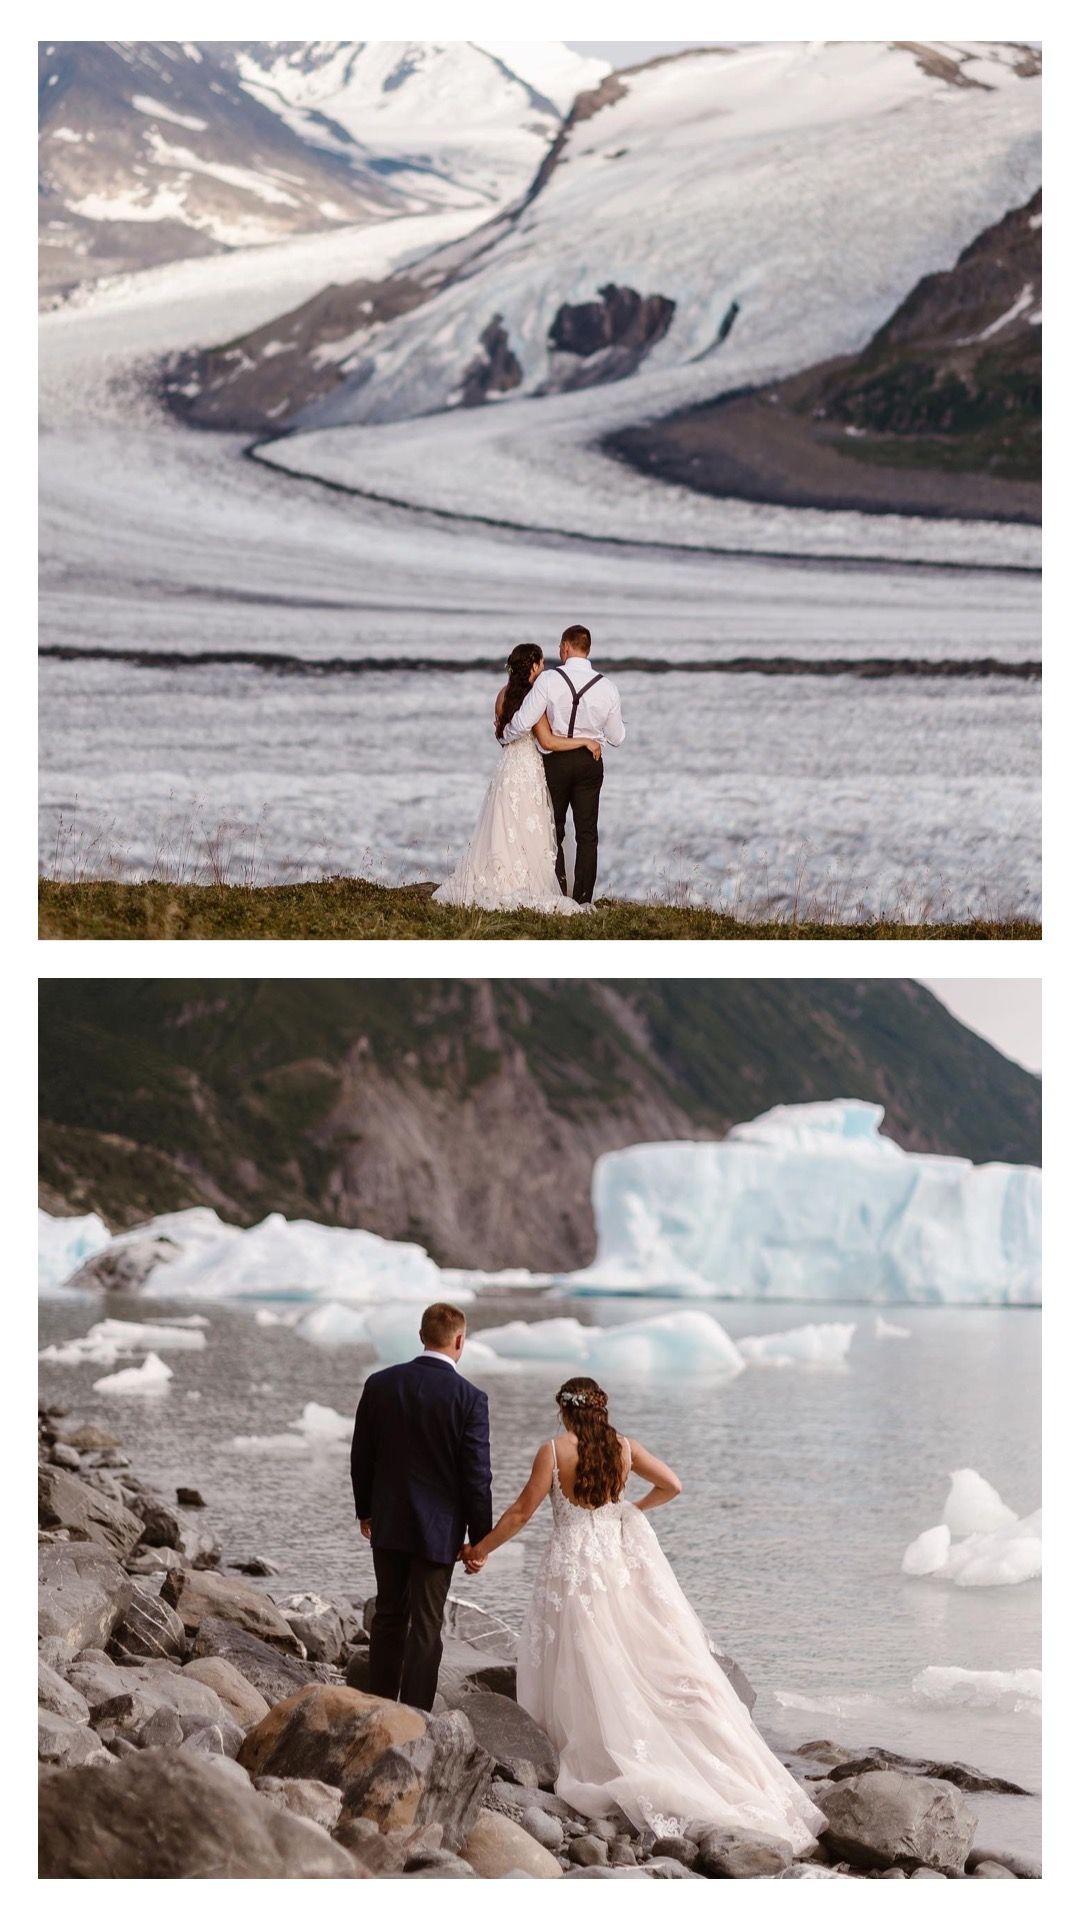 Elope to Alaska with Alaska Destination Weddings - Alaska